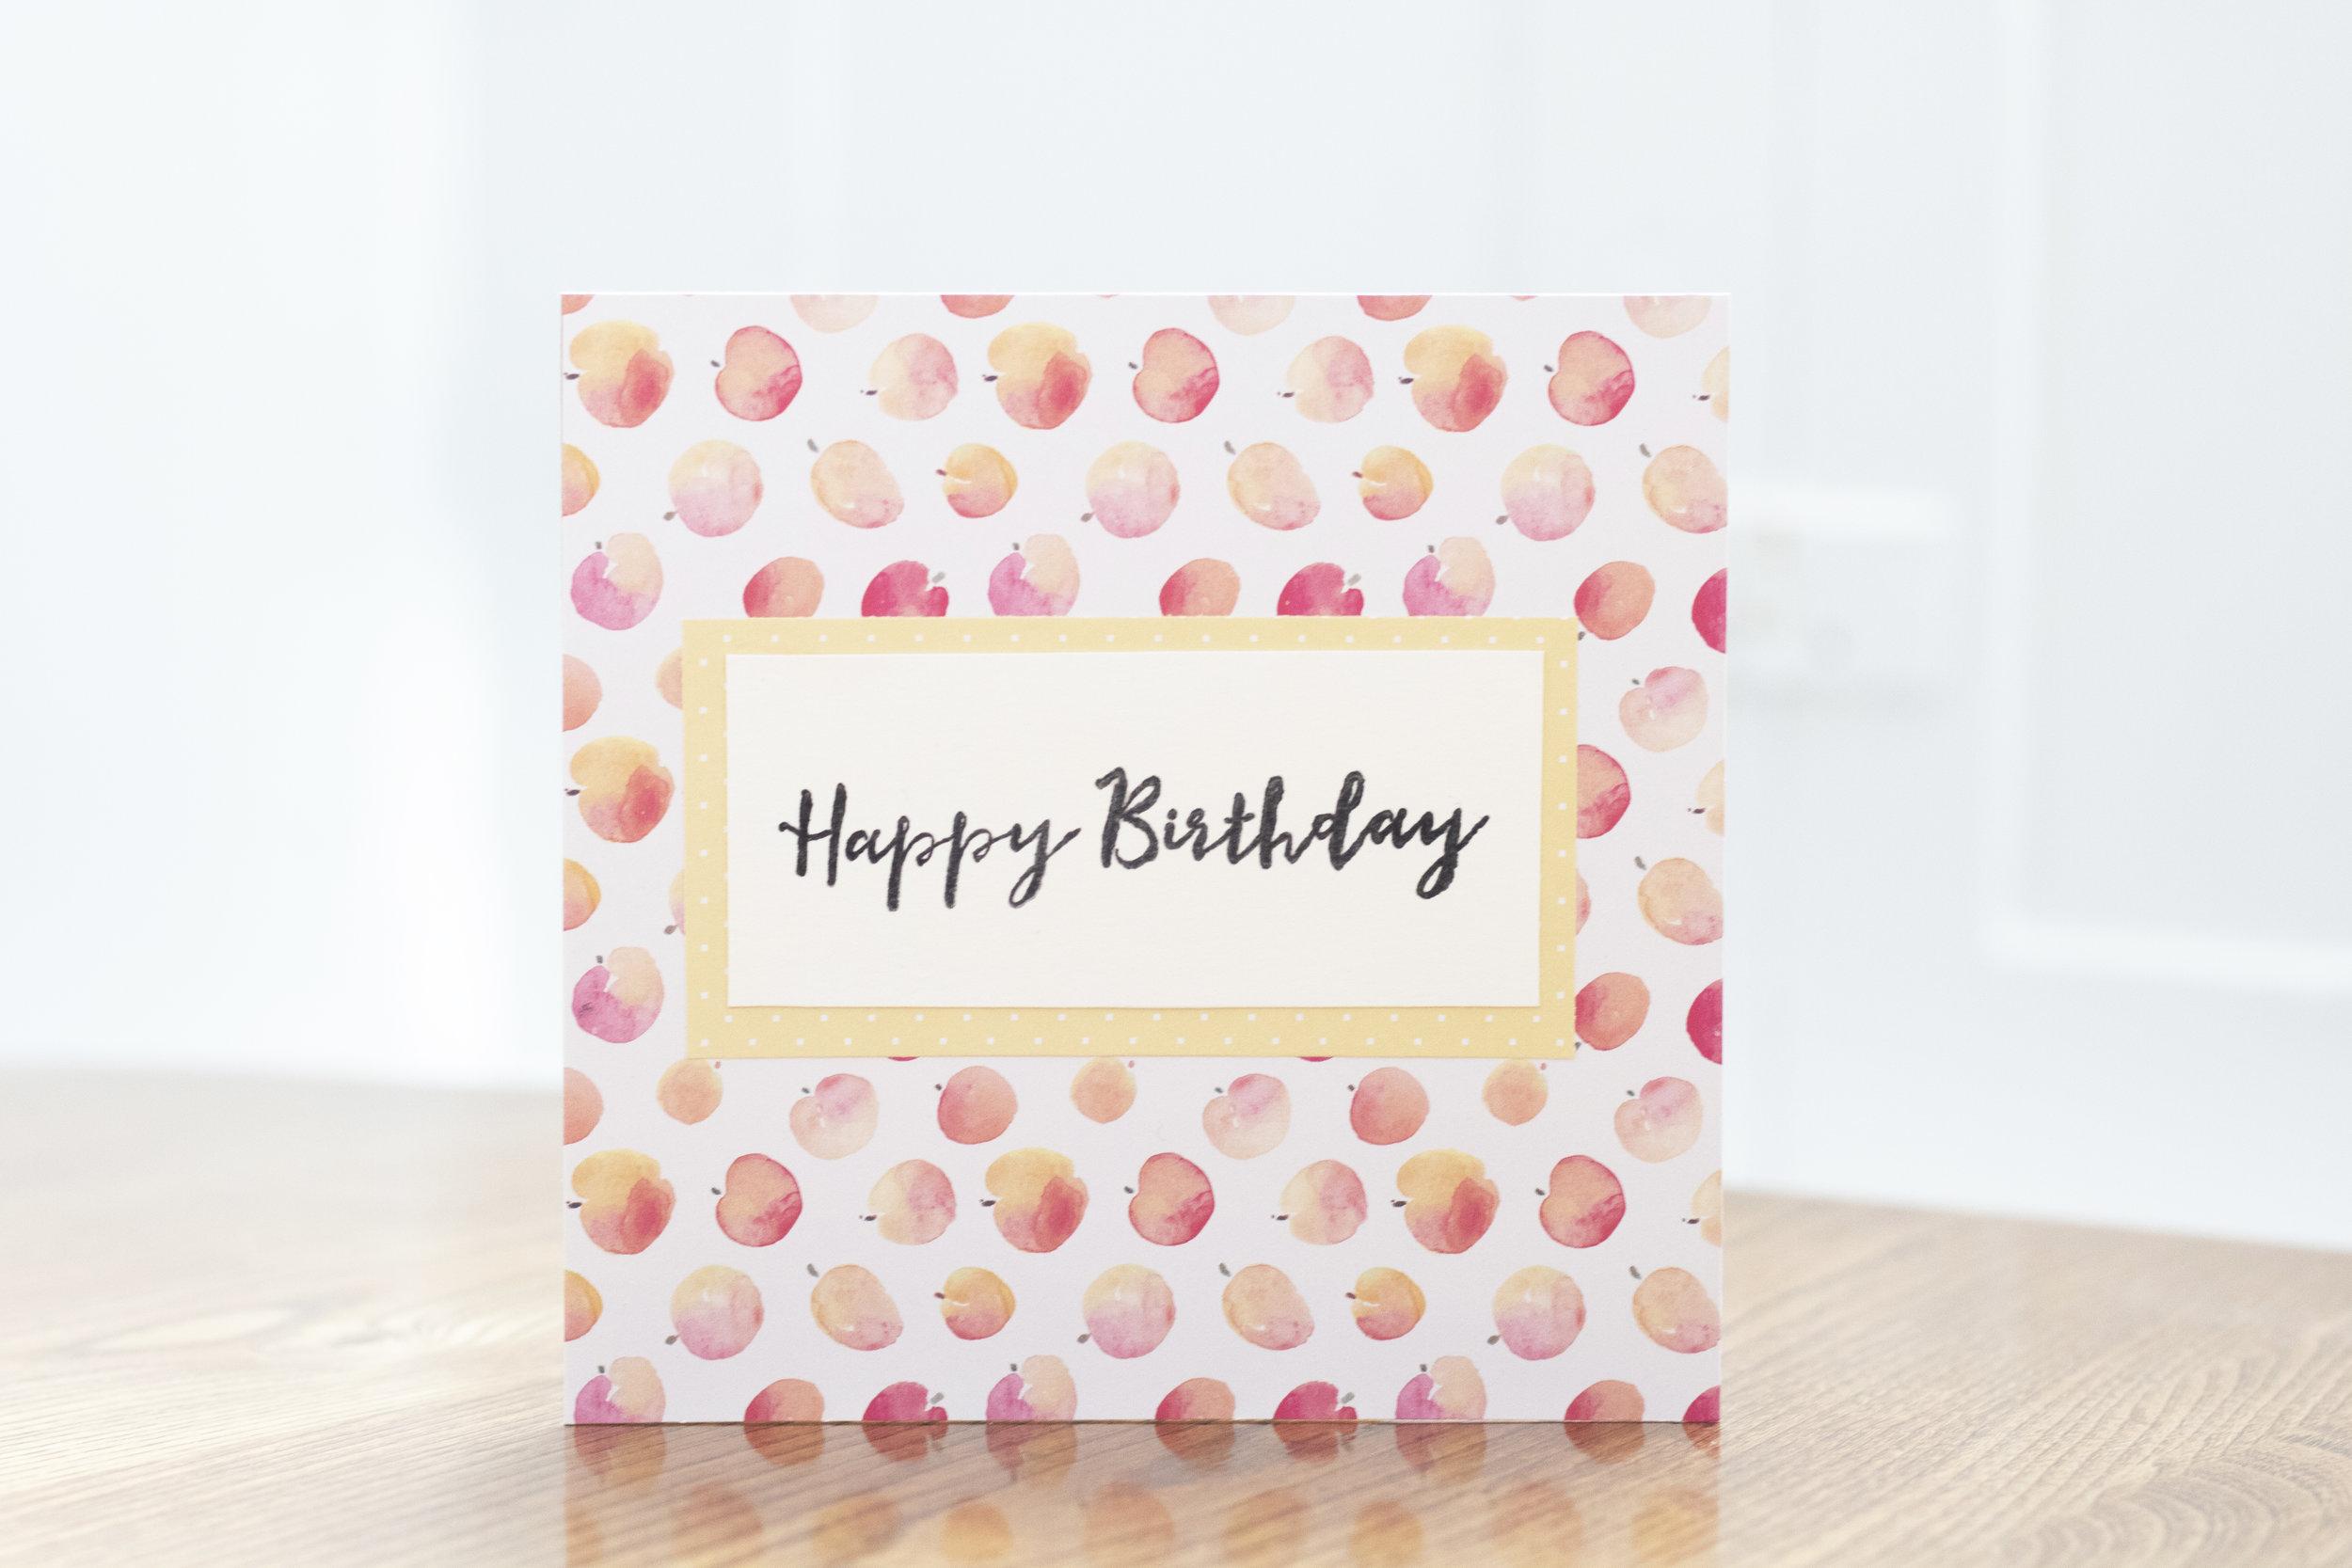 Happy Birthday Card Craft.jpg